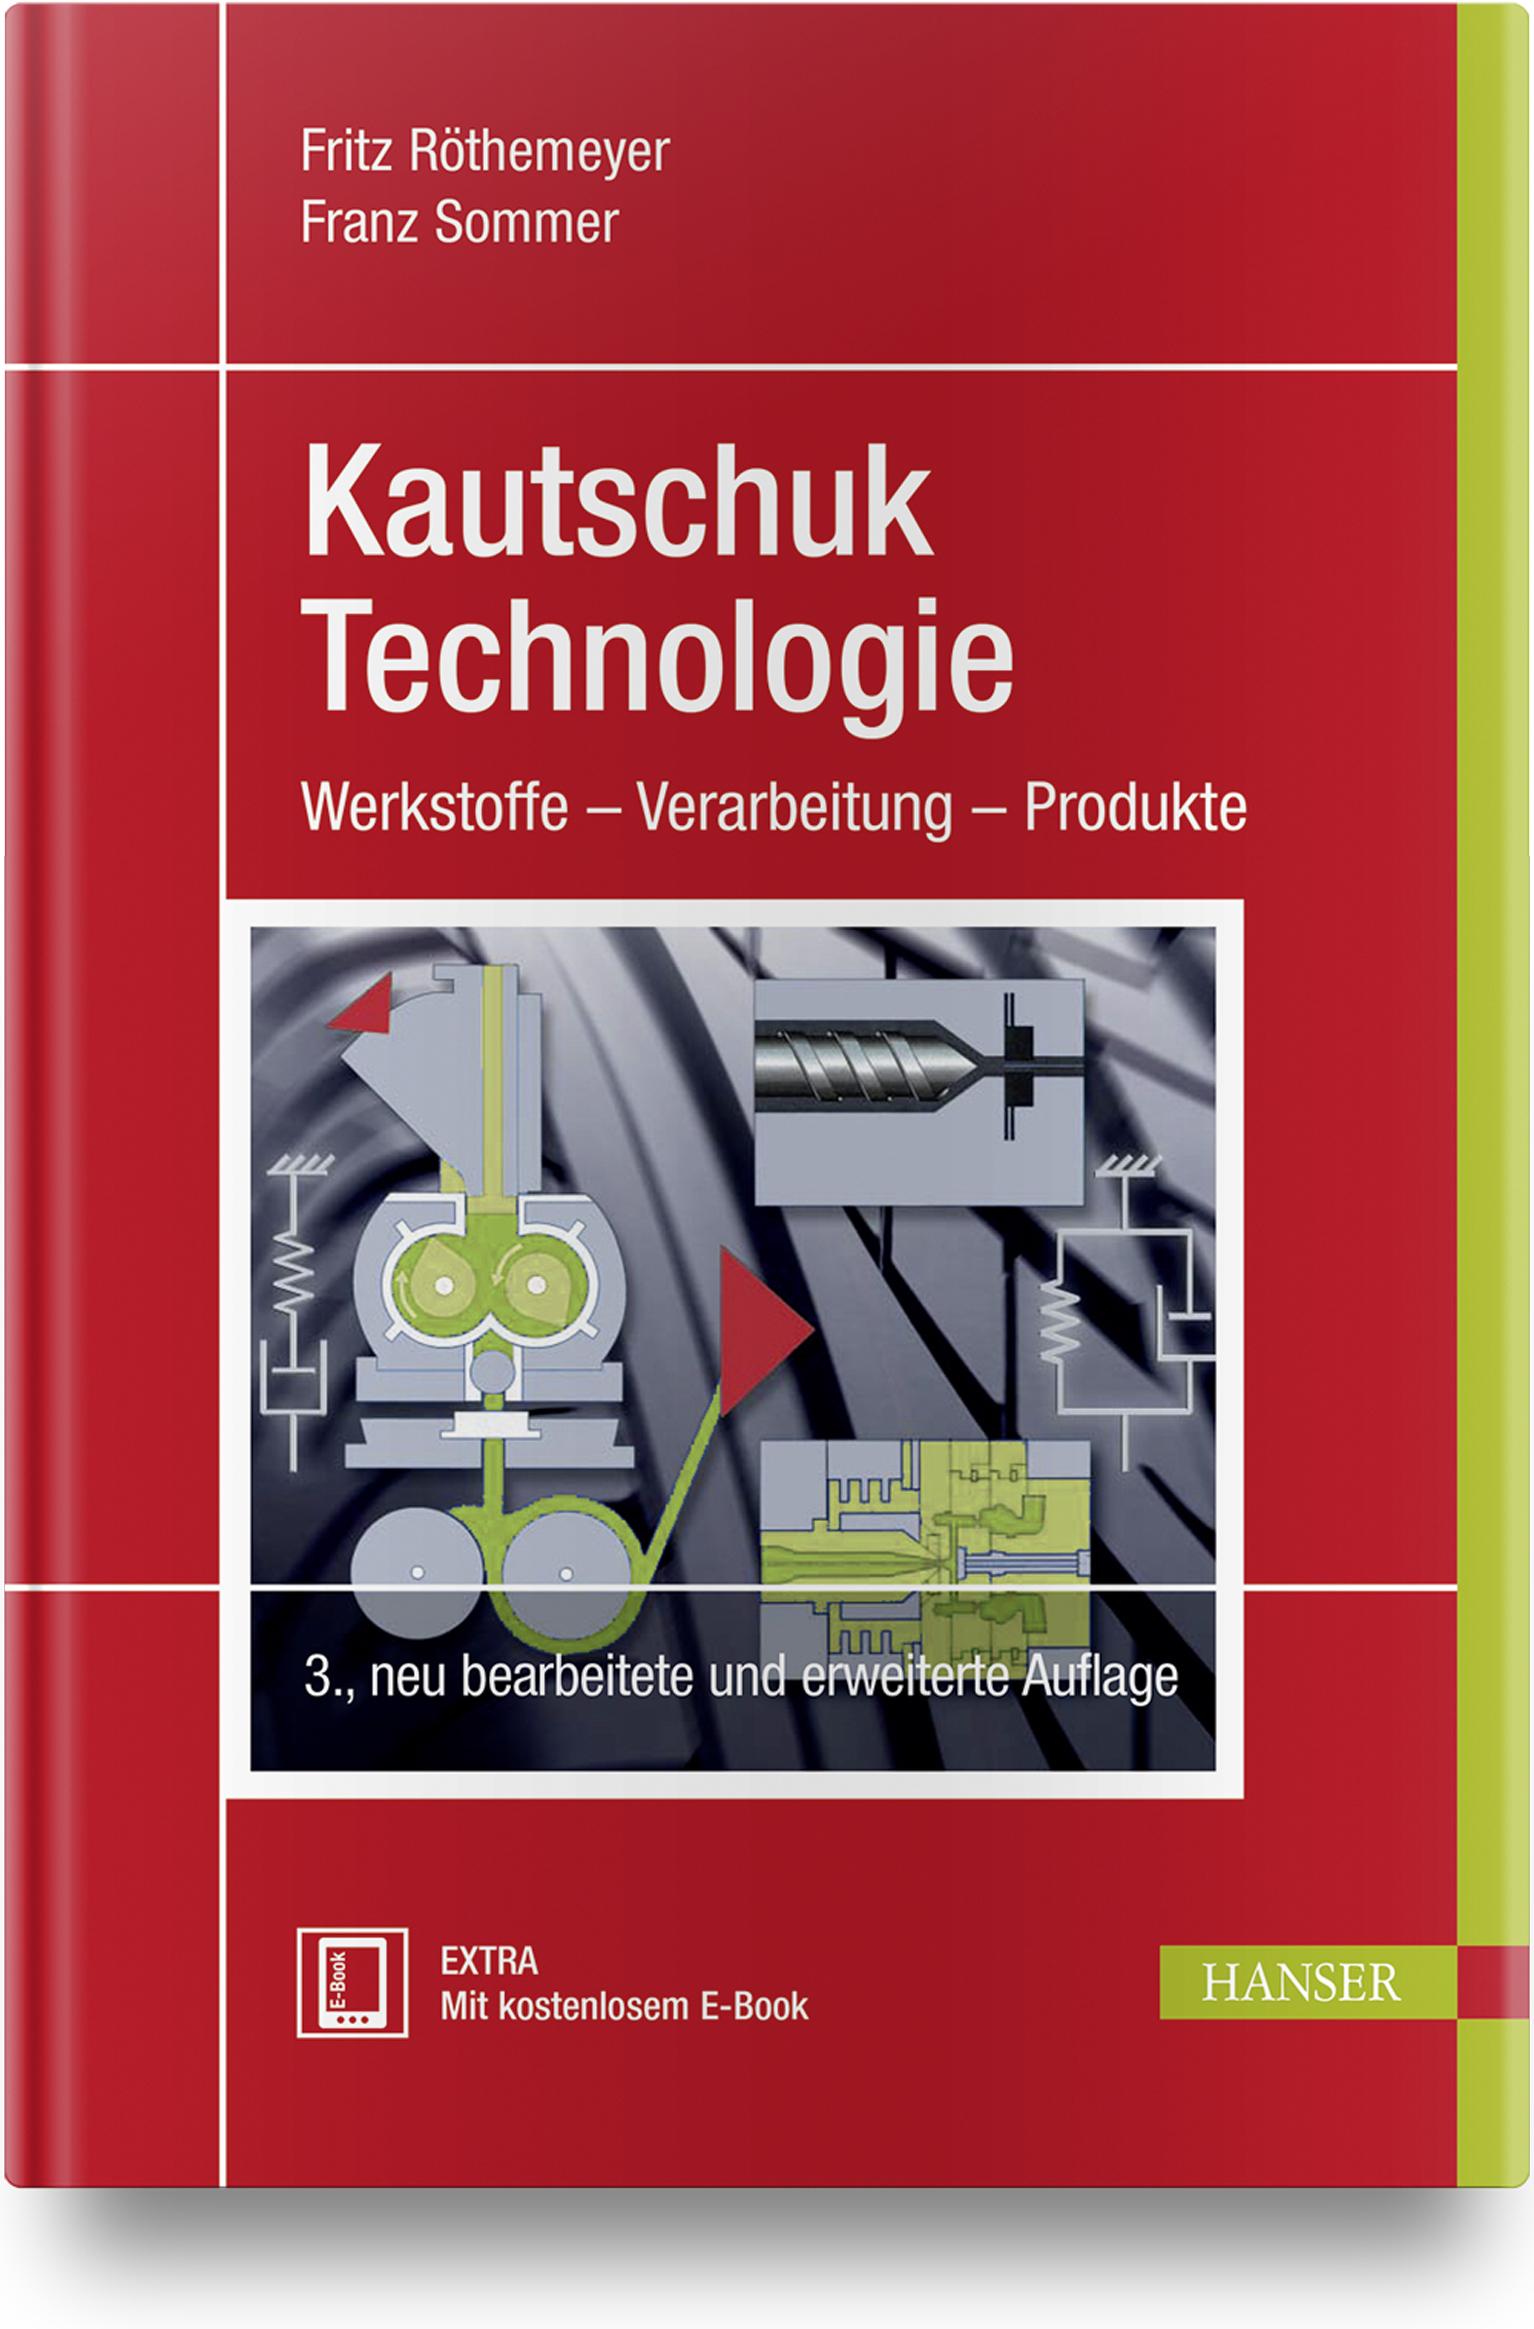 Röthemeyer, Sommer, Kautschuktechnologie, 978-3-446-43776-0